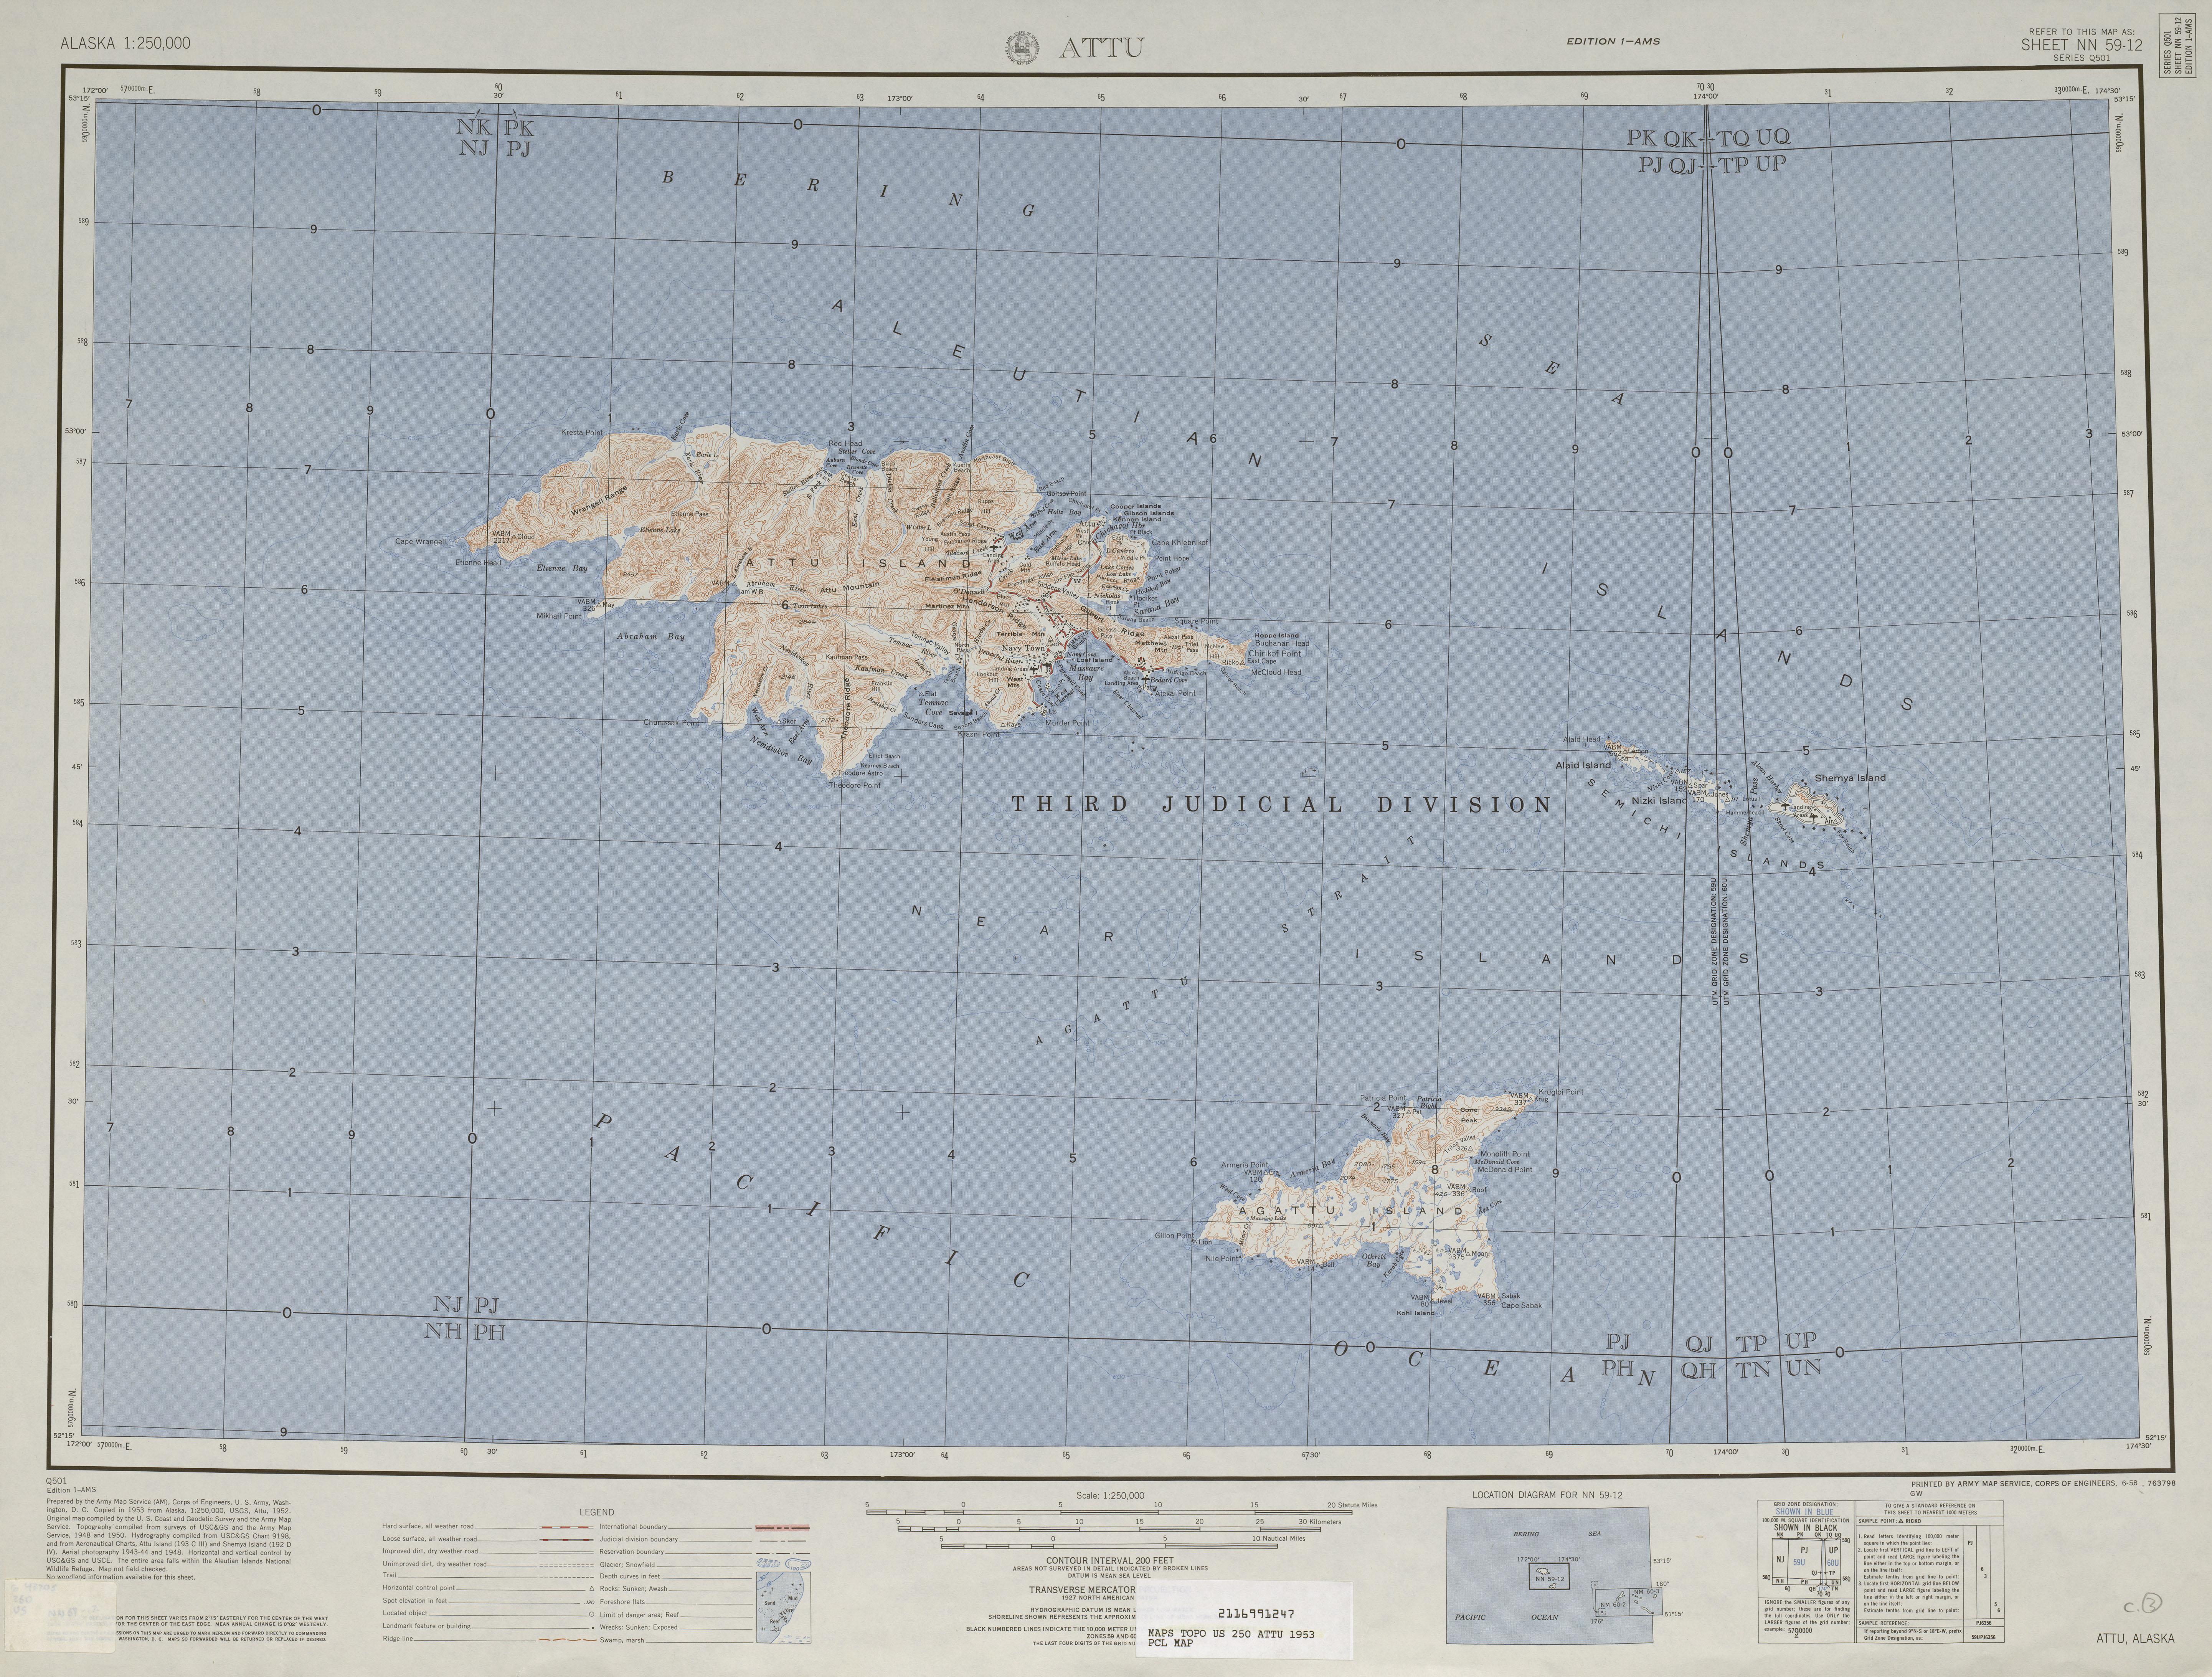 Attu Topographic Map Sheet, United States 1953